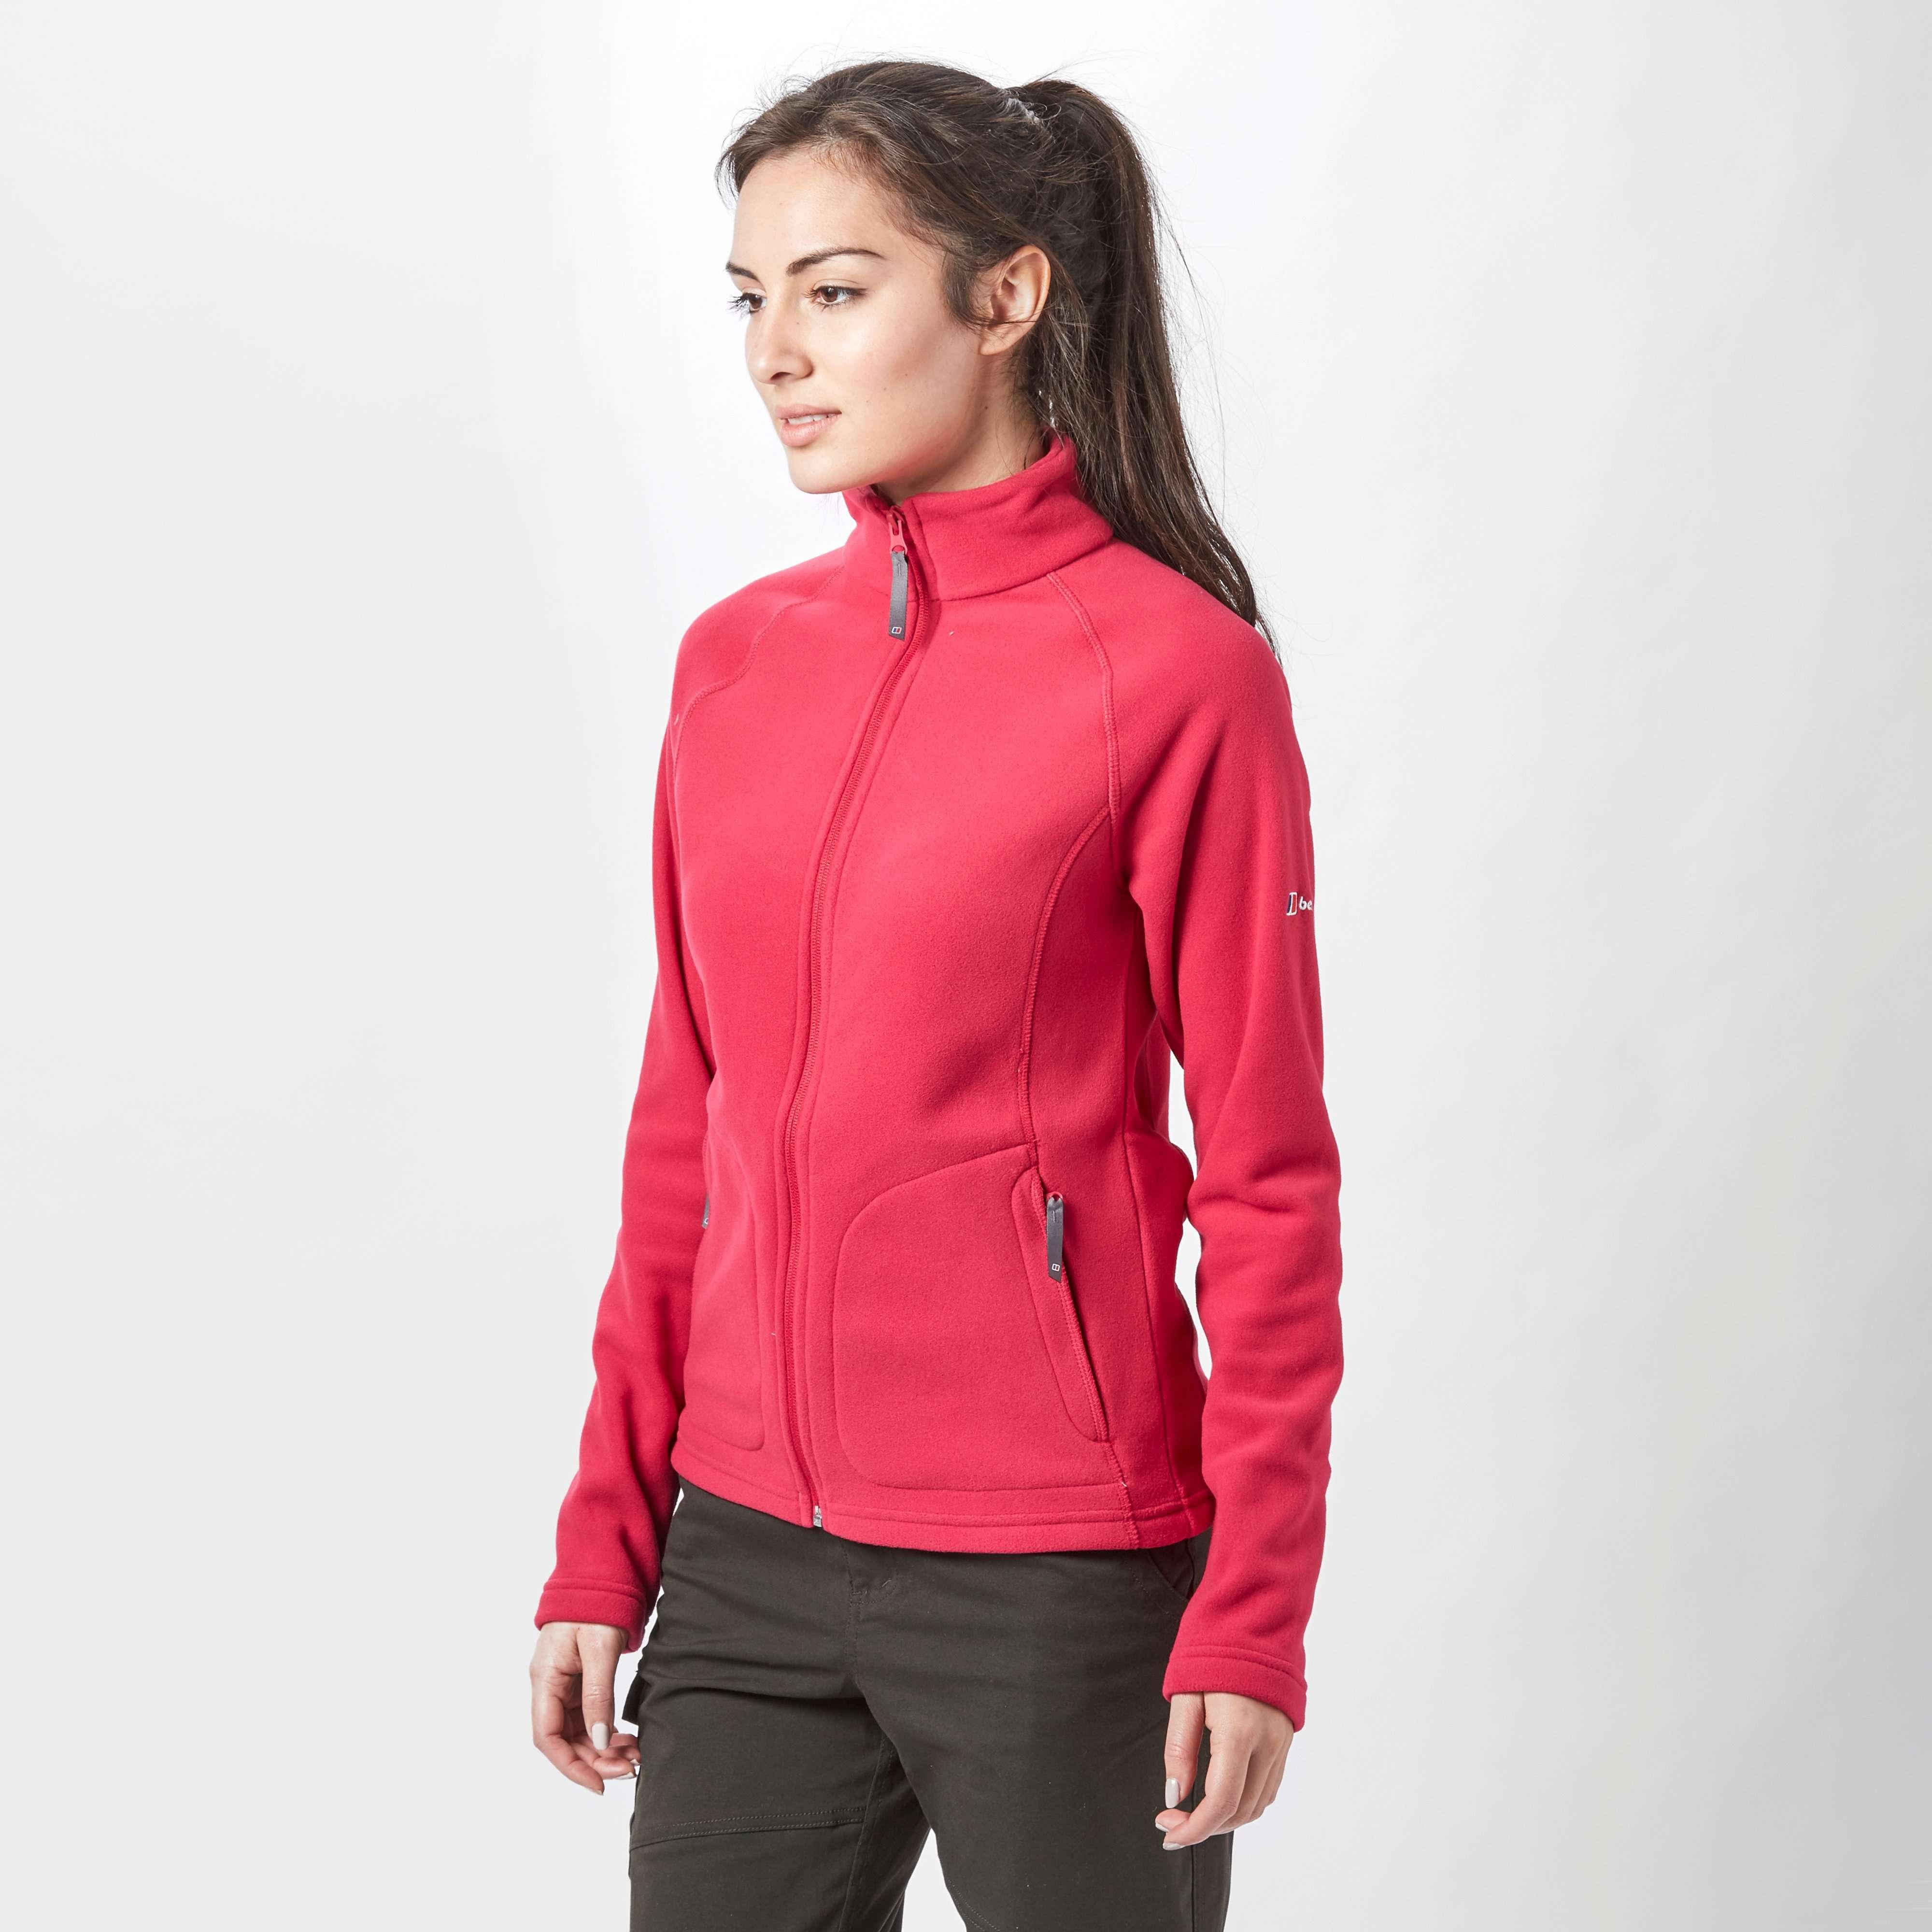 BERGHAUS Women's Arnside Fleece Jacket